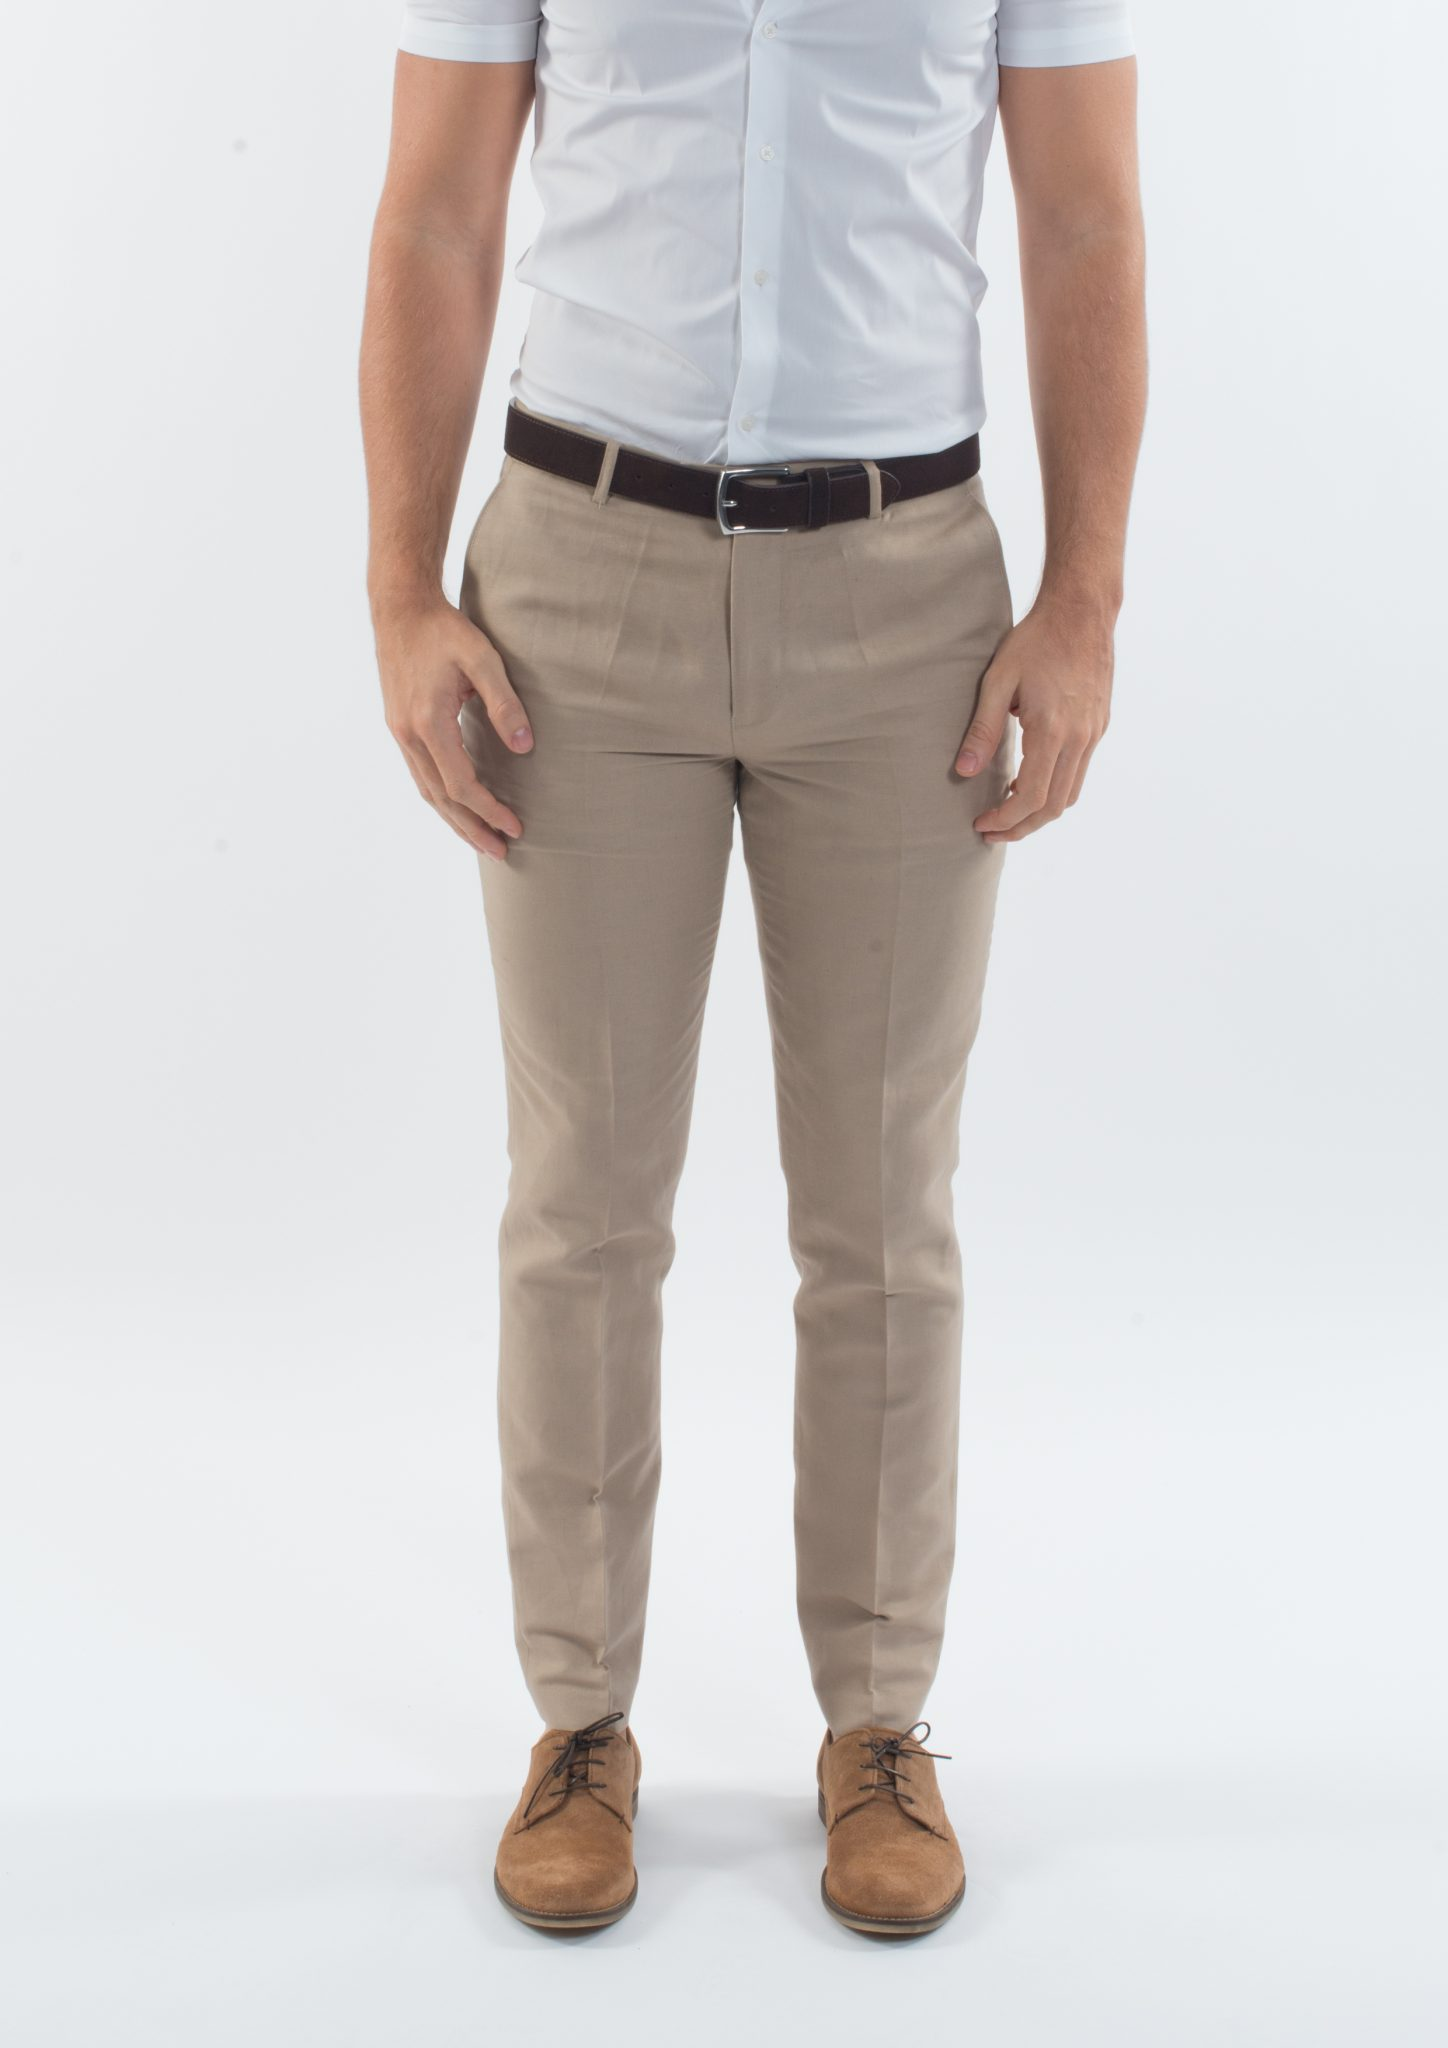 4285100c6d5 Home   Men   Waistcoats   Wedding Slim Fit Linen Blend Trousers